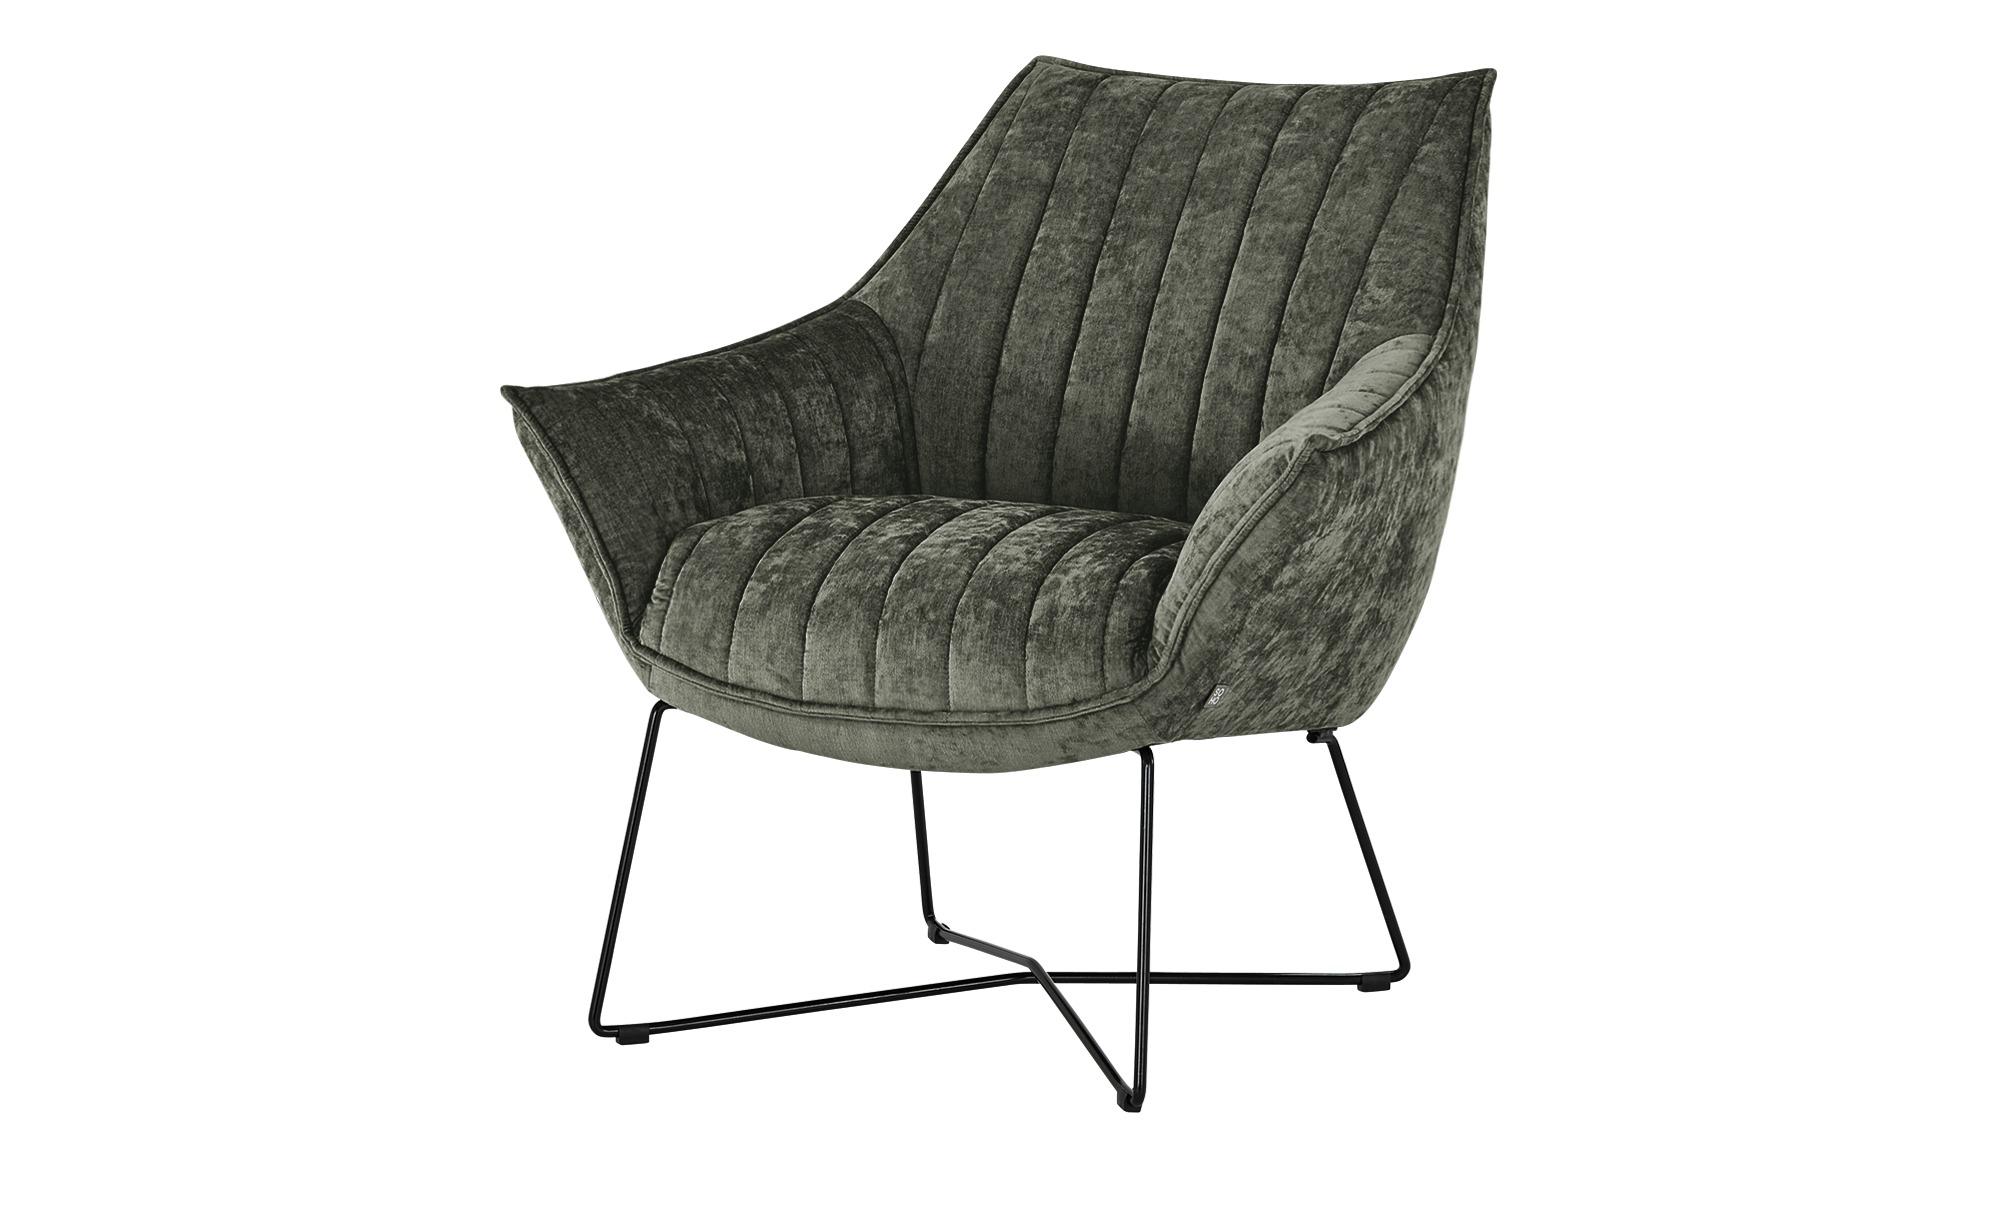 SOHO Sessel  Egeria ¦ grau ¦ Maße (cm): B: 86 H: 80 T: 83 Polstermöbel > Sessel > Polstersessel - Höffner